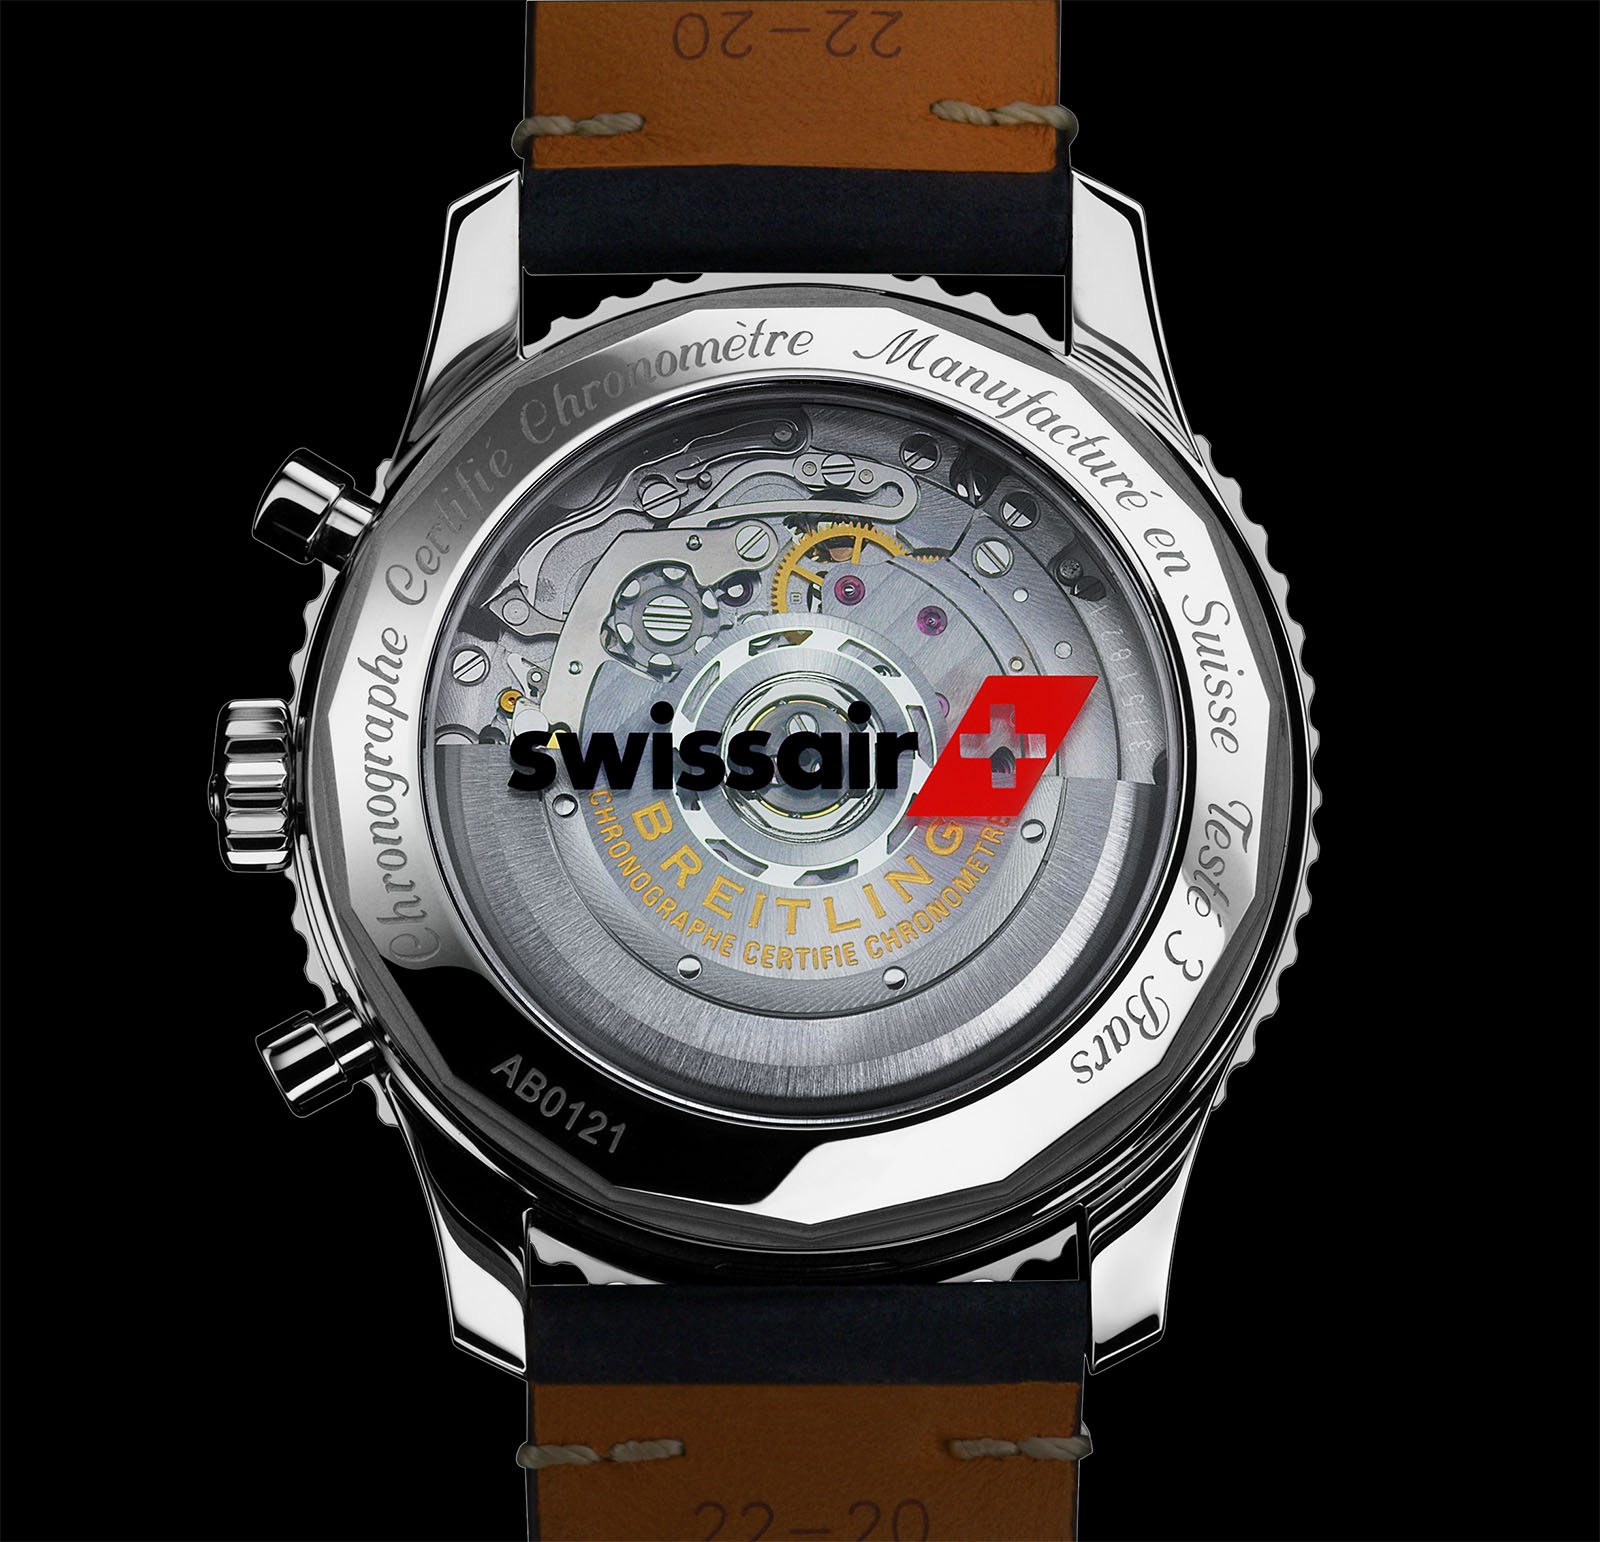 Breitling Navitimer 1 B01 Chronograph 43 Swissair Edition 2